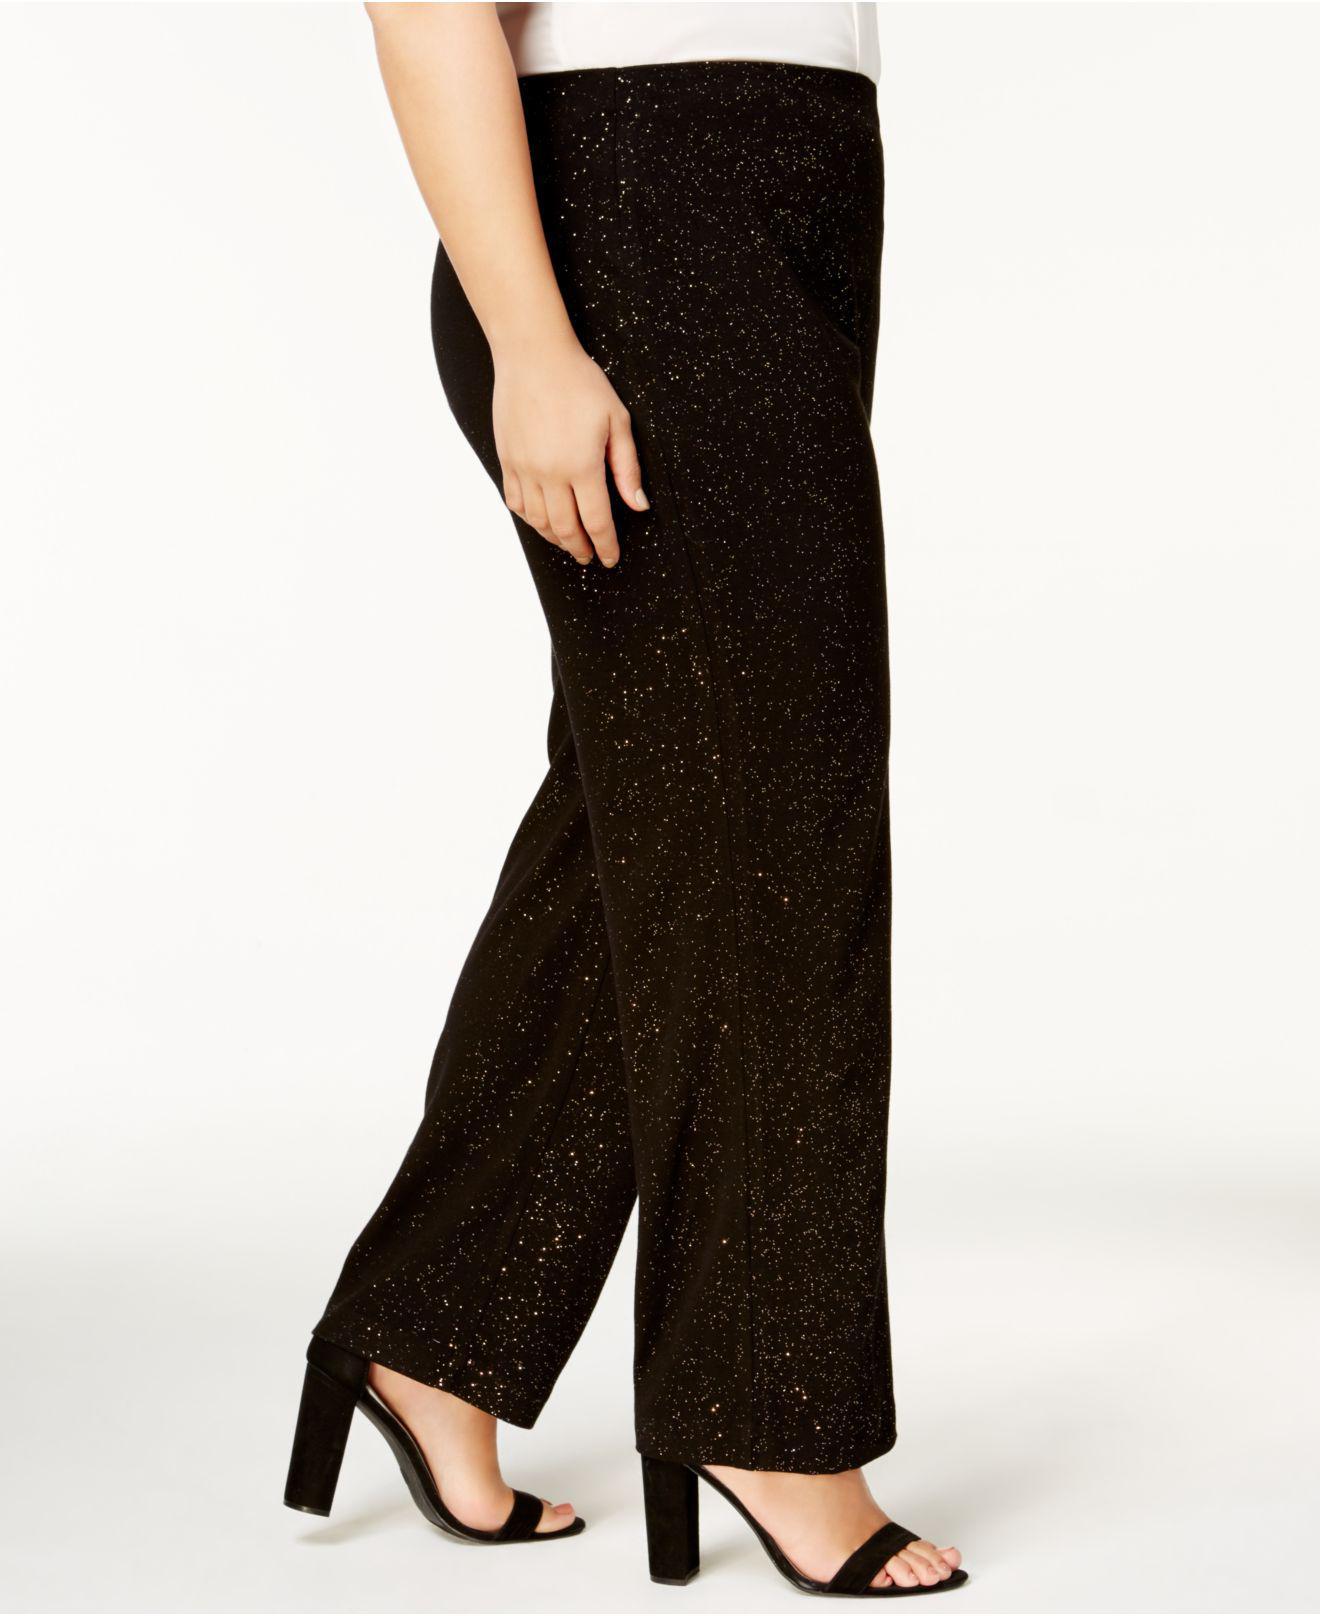 0824e36d6aeac7 Alfani Plus Size Wide-leg Glitter Pants in Black - Lyst